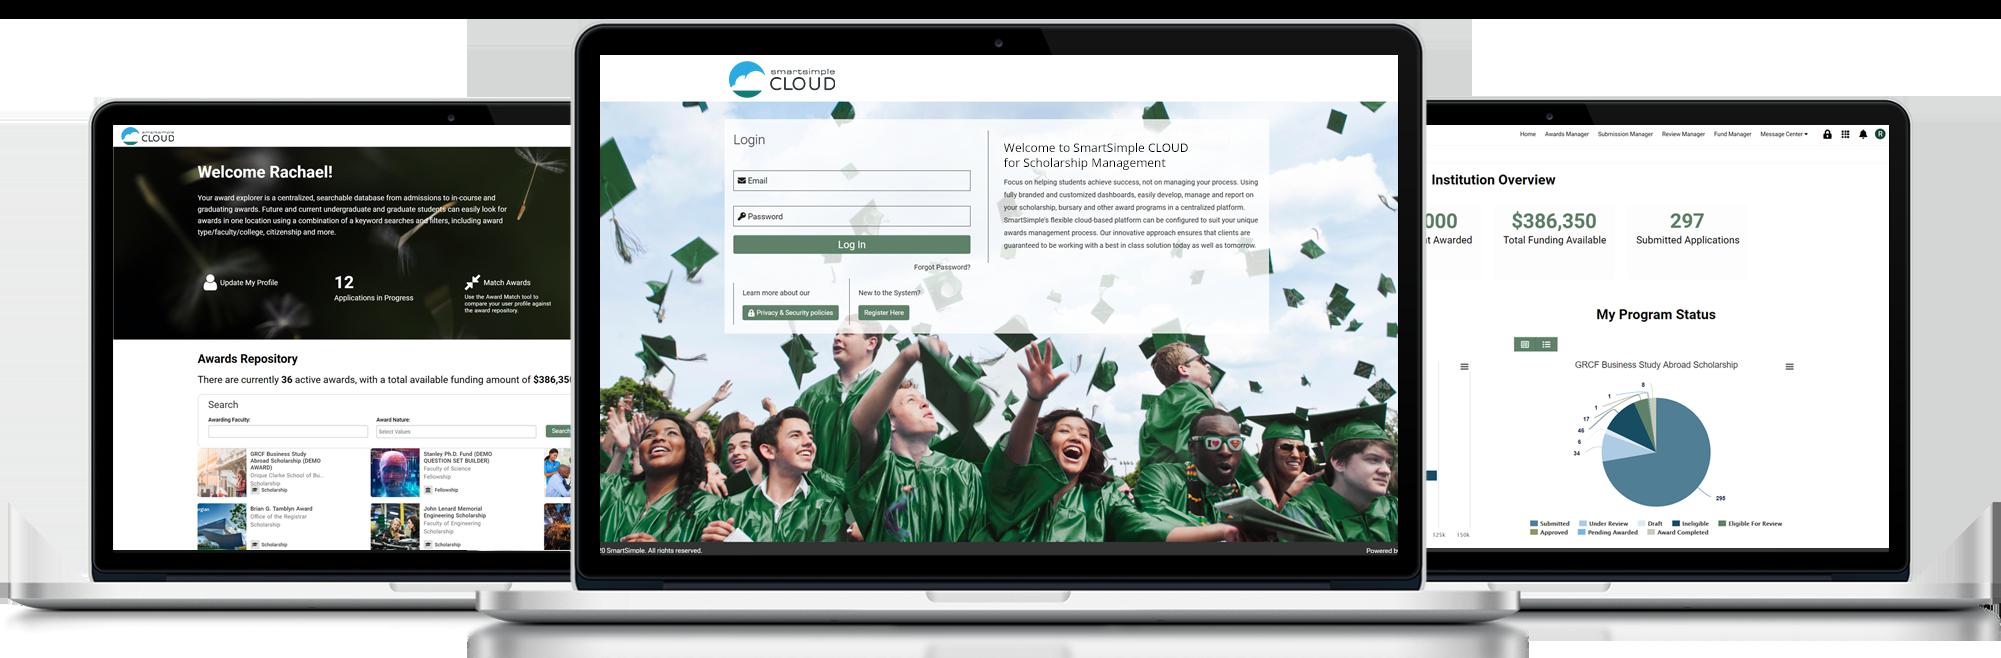 SmartSimple Cloud for Scholarship Management